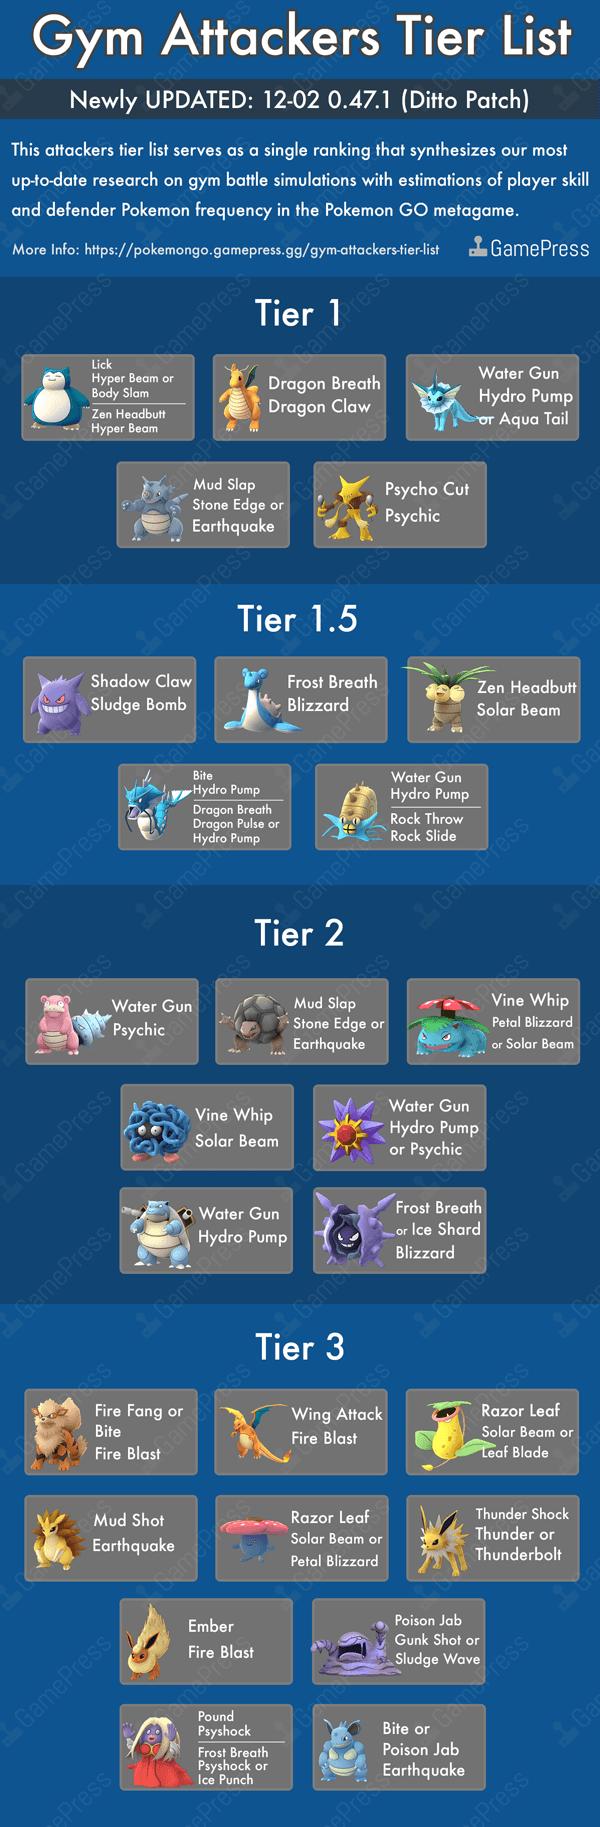 Pokemon Go Top Tier Attackers